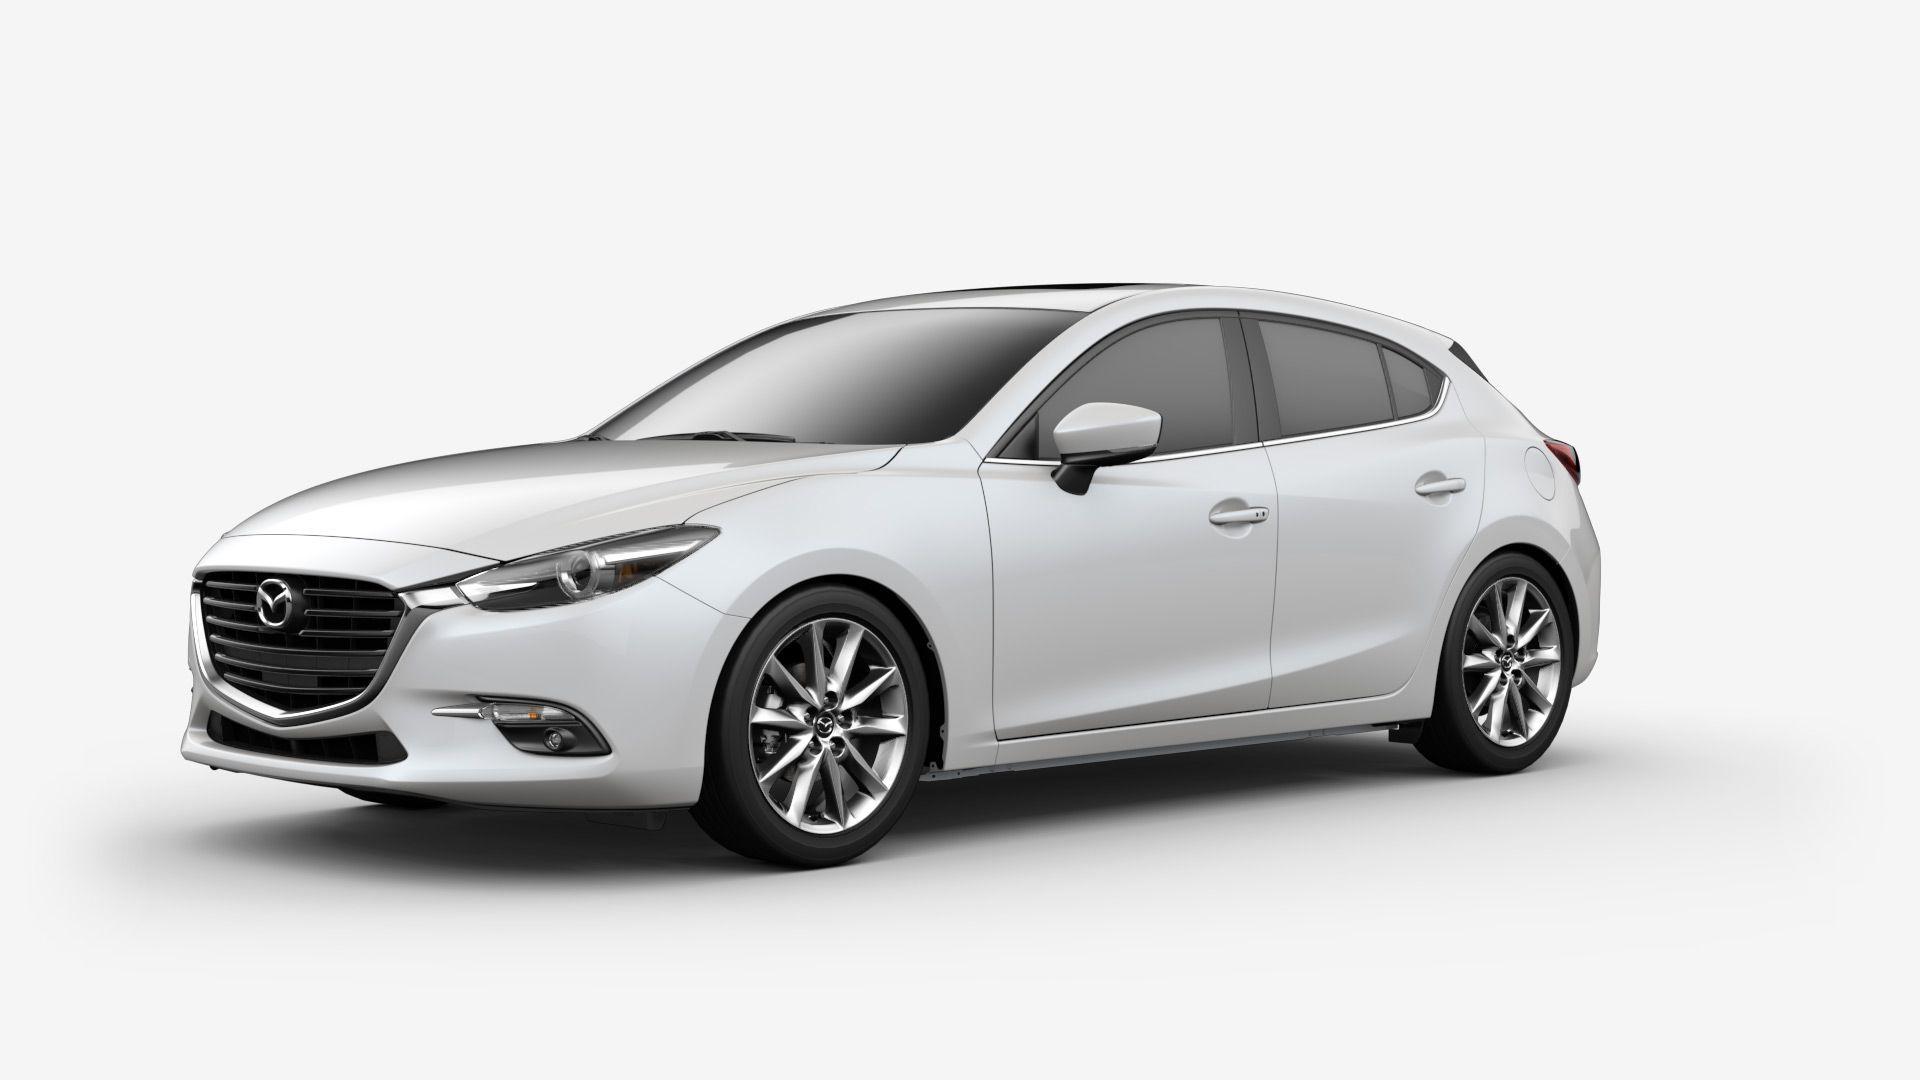 The 2018 Mazdaspeed 3 Specs Sports car, Mazda, Car